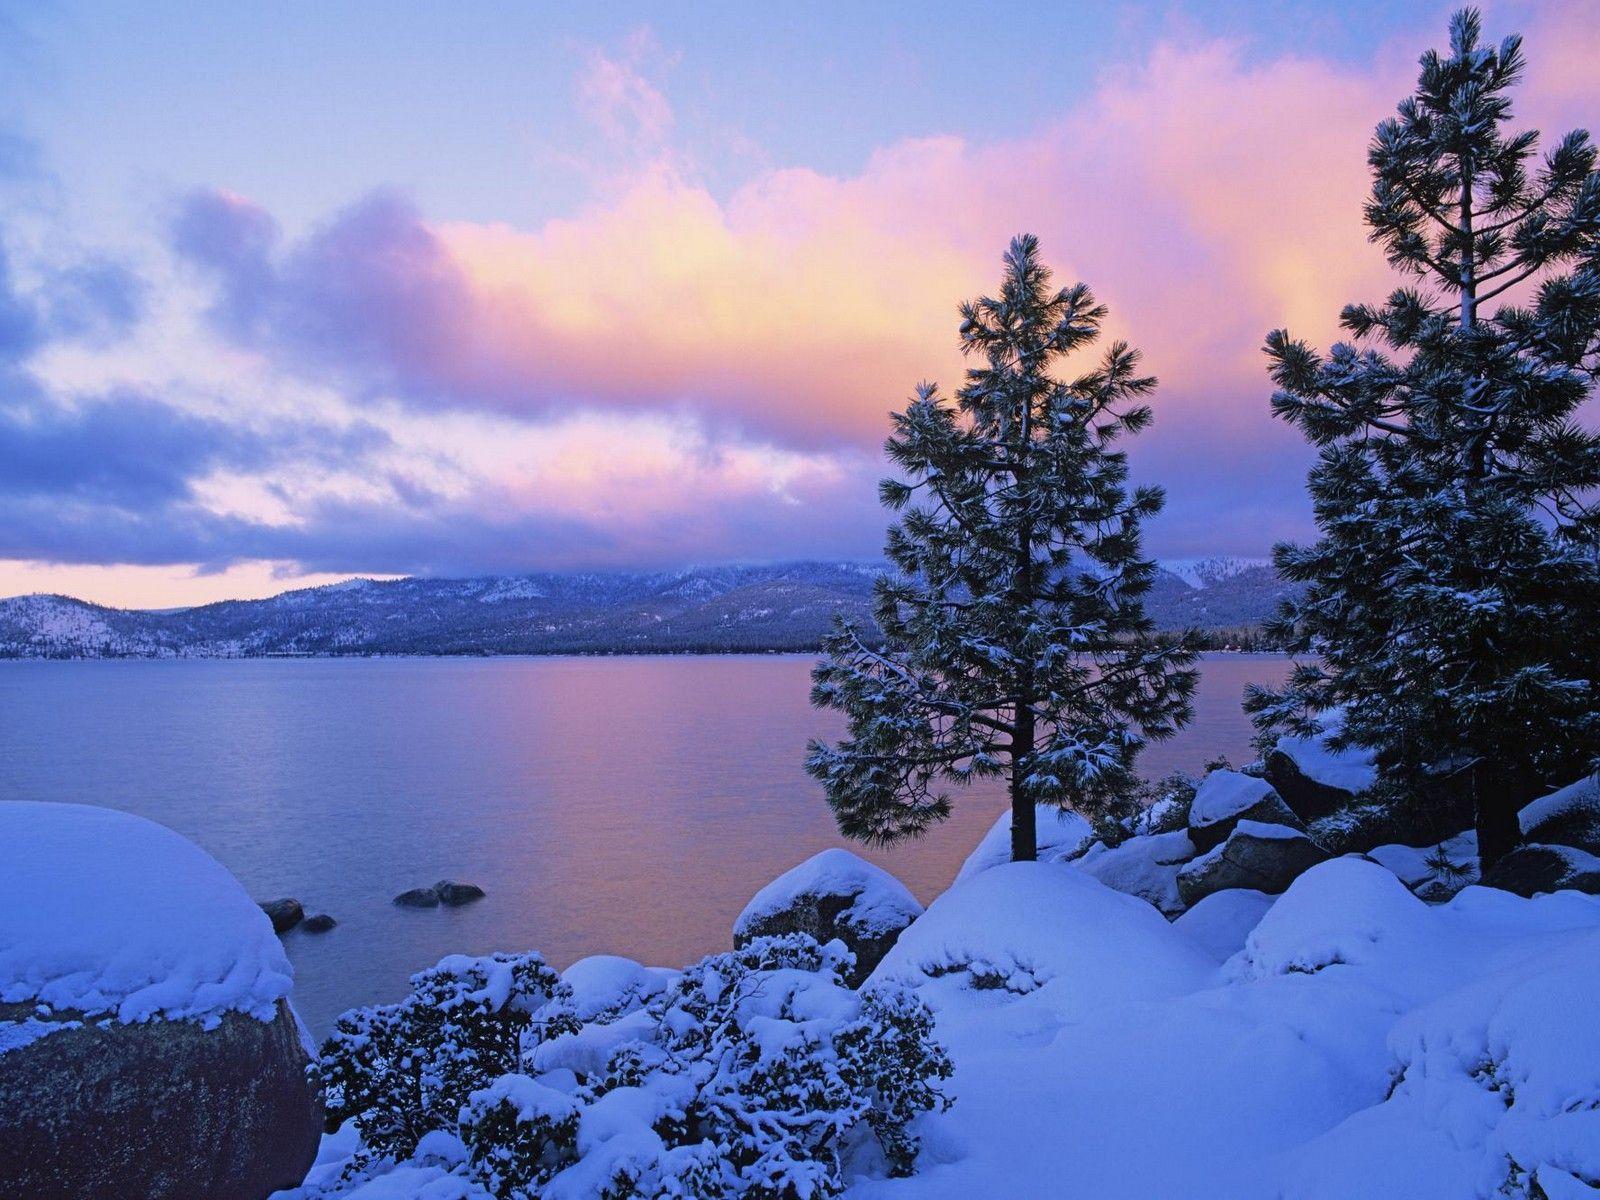 Winter Backgrounds Winter wallpapers Pinterest